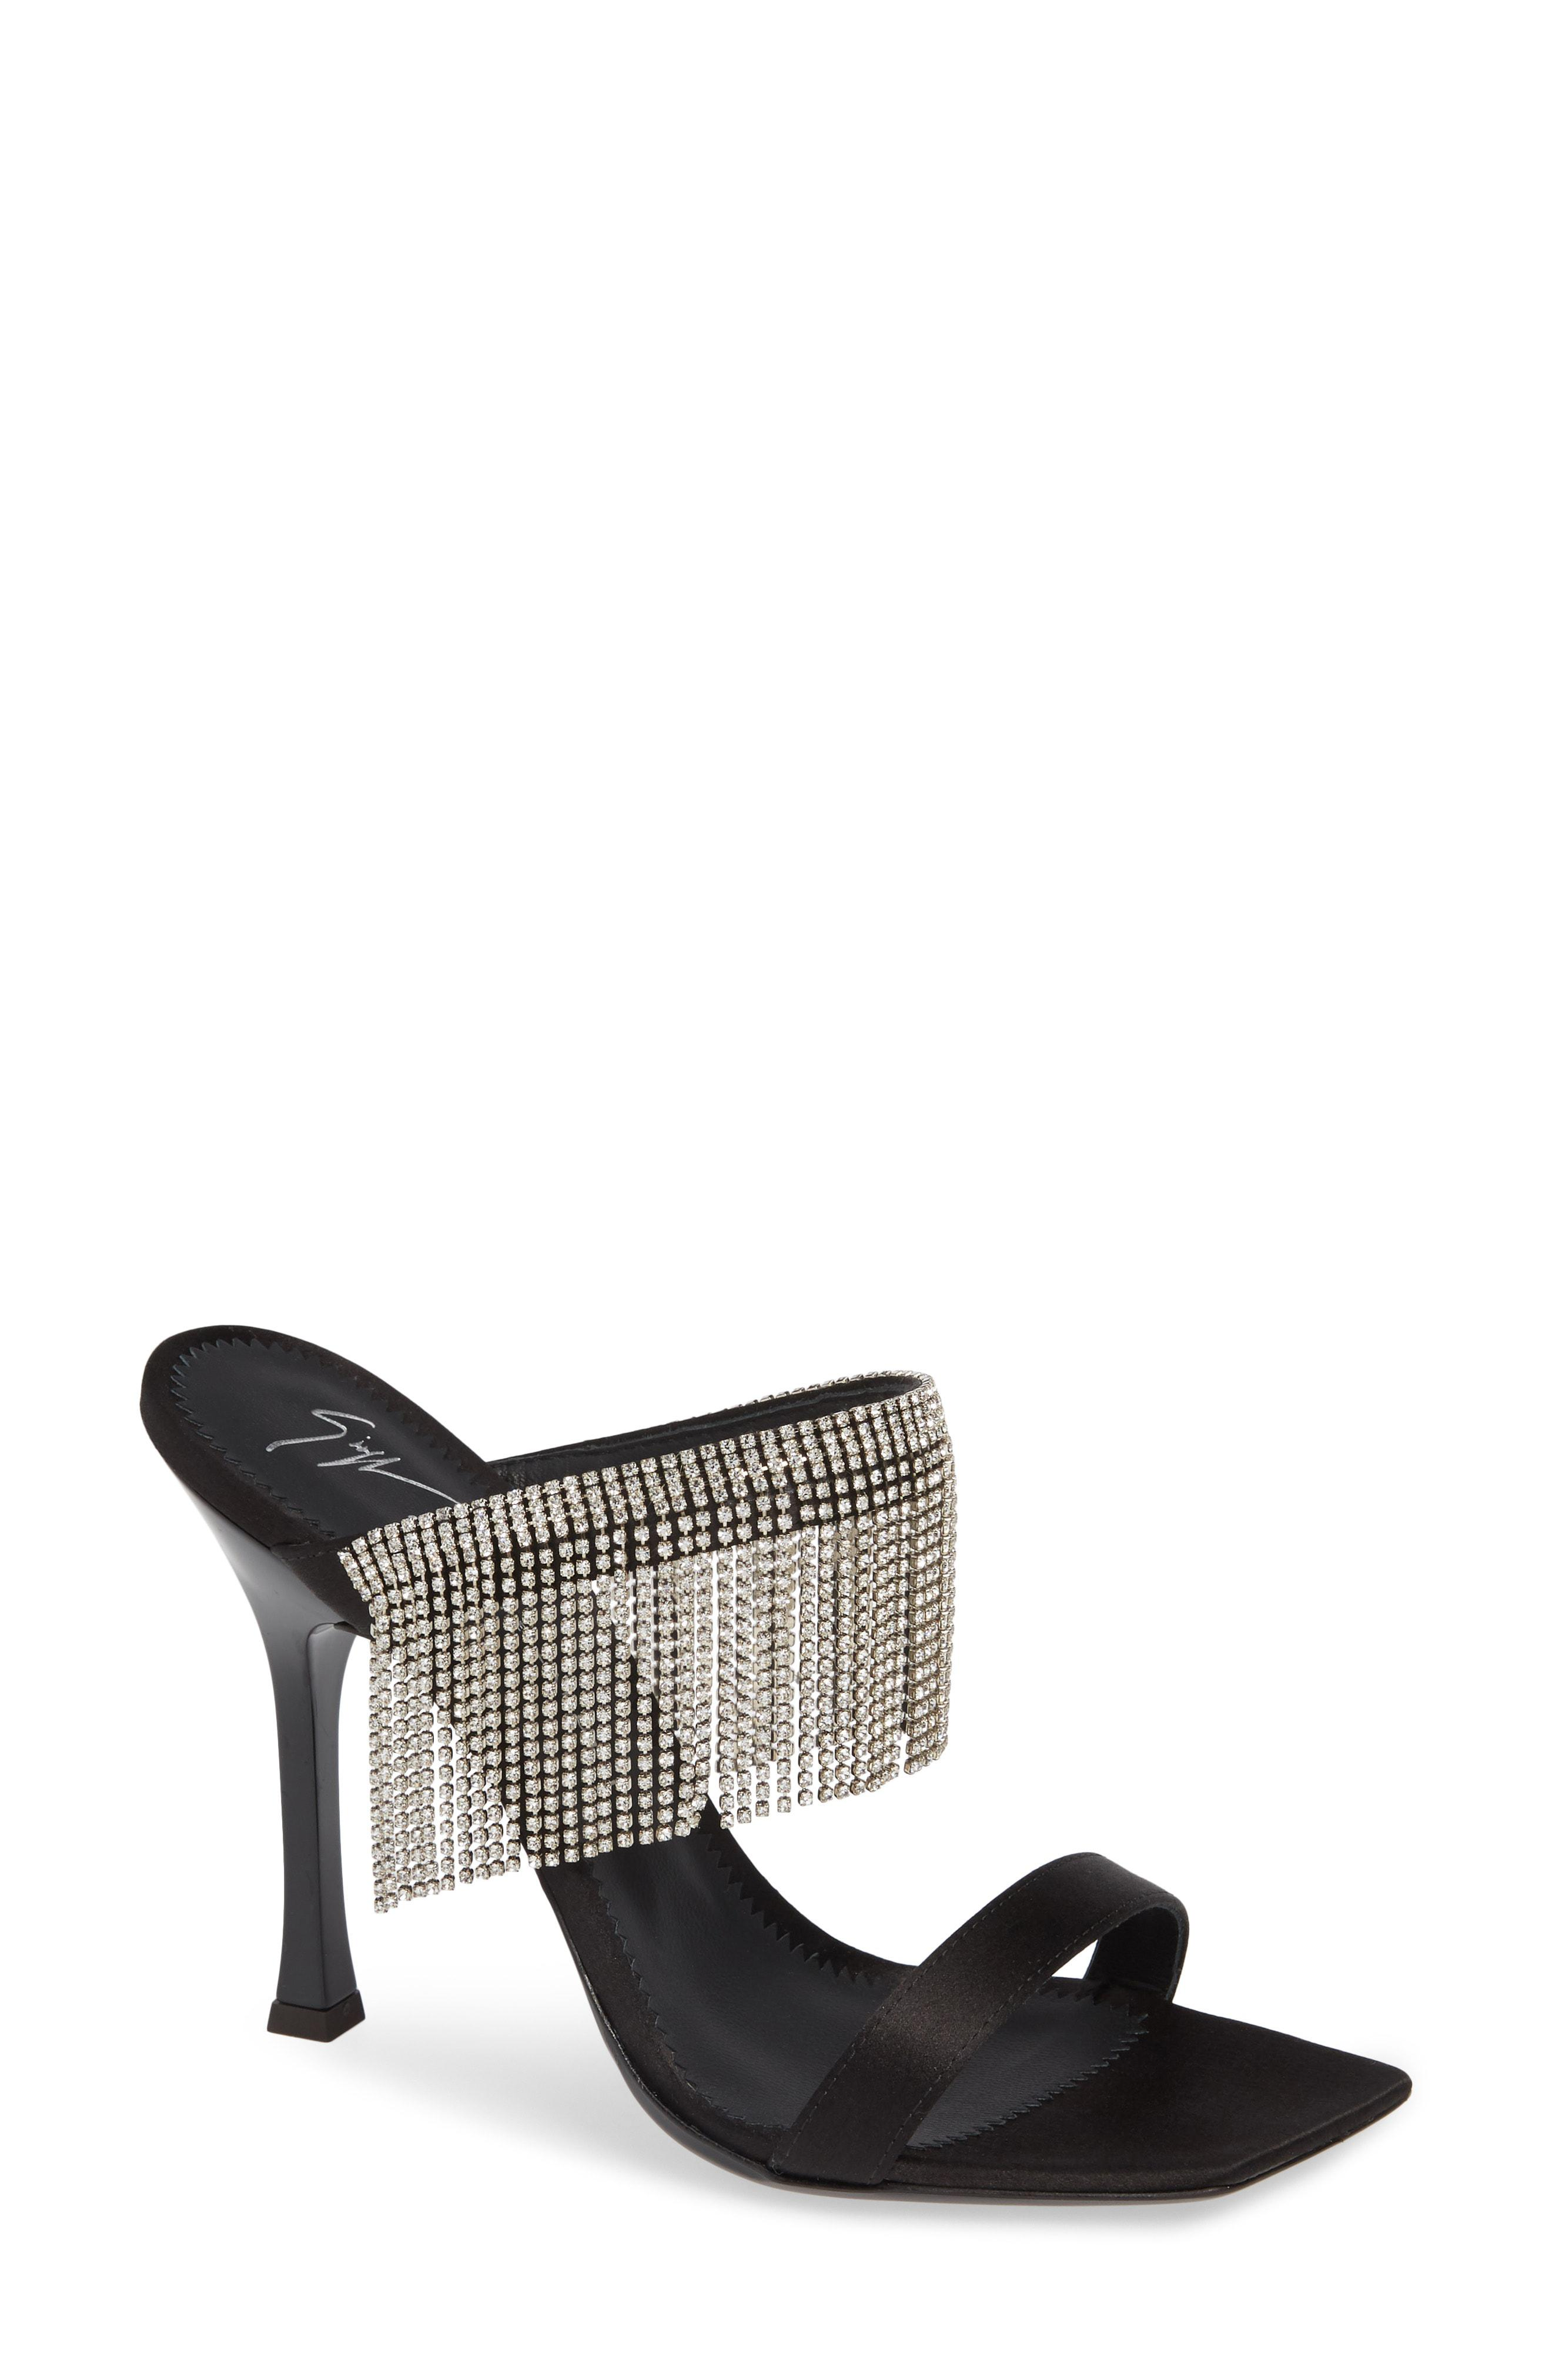 fe34378986ad9 Giuseppe Zanotti. Women's Swarovski Crystal Fringe Sandal